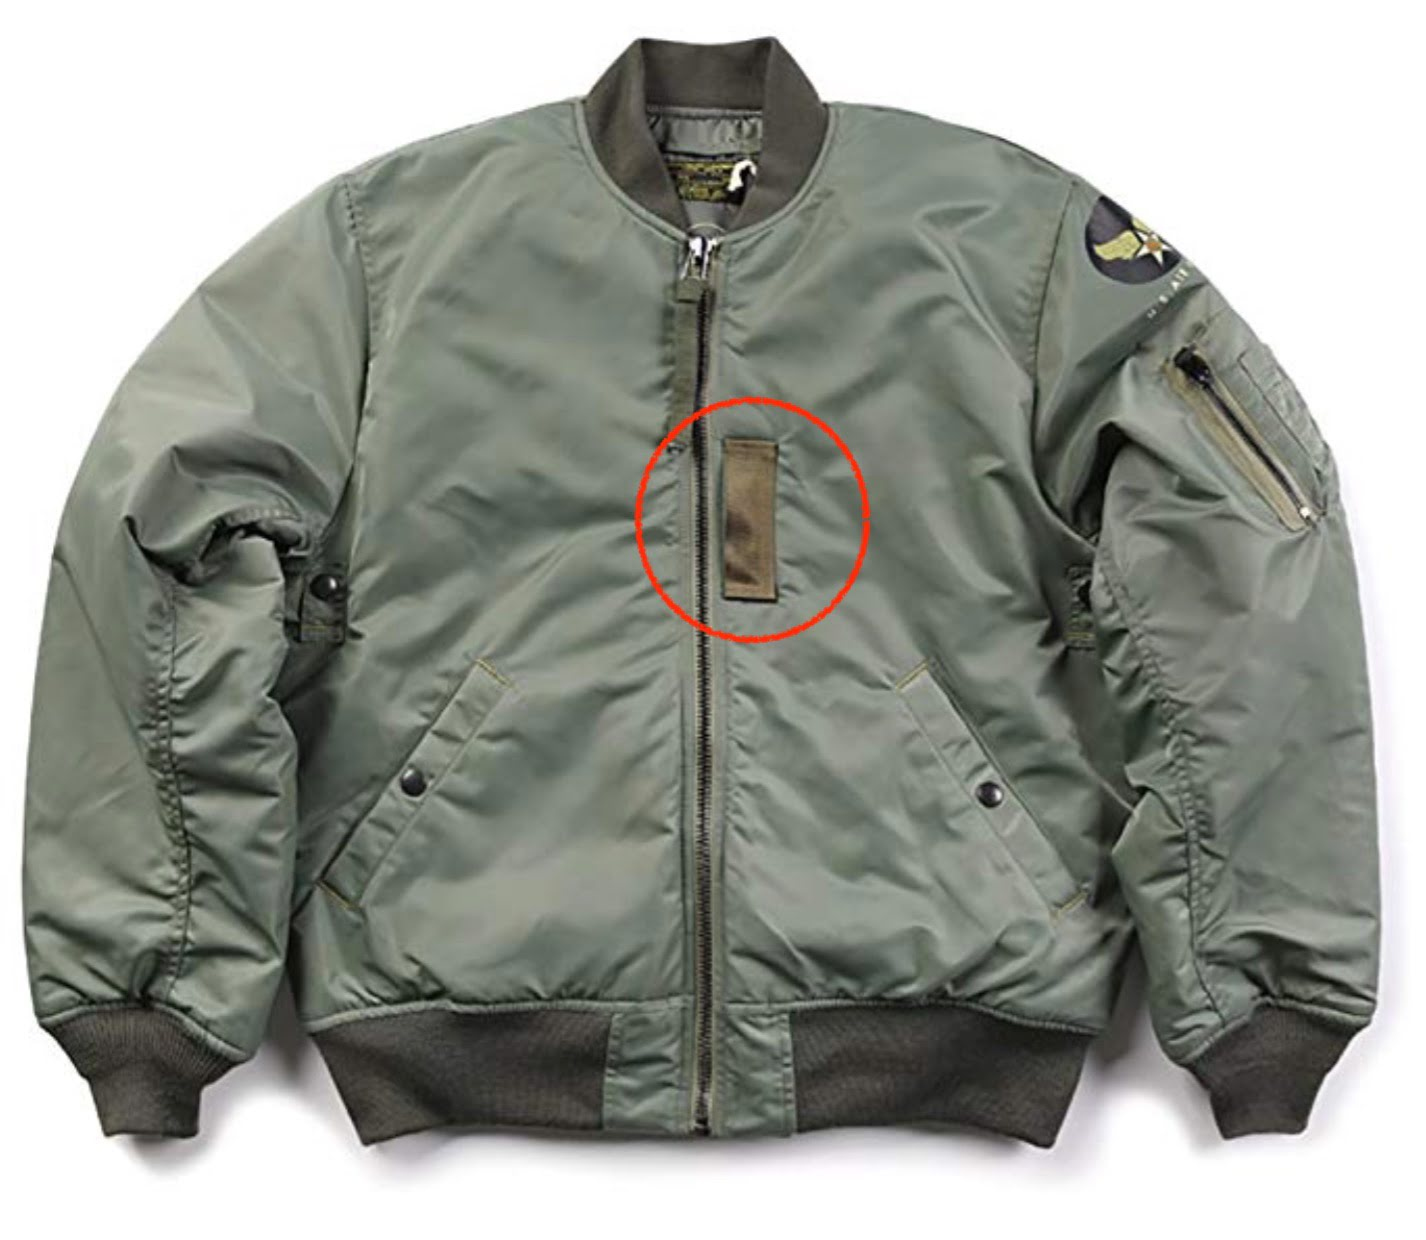 US Air Force Flight Bomber Jacket Sample 空軍飛行夾克左胸口前的垂直束帶布條的功用?